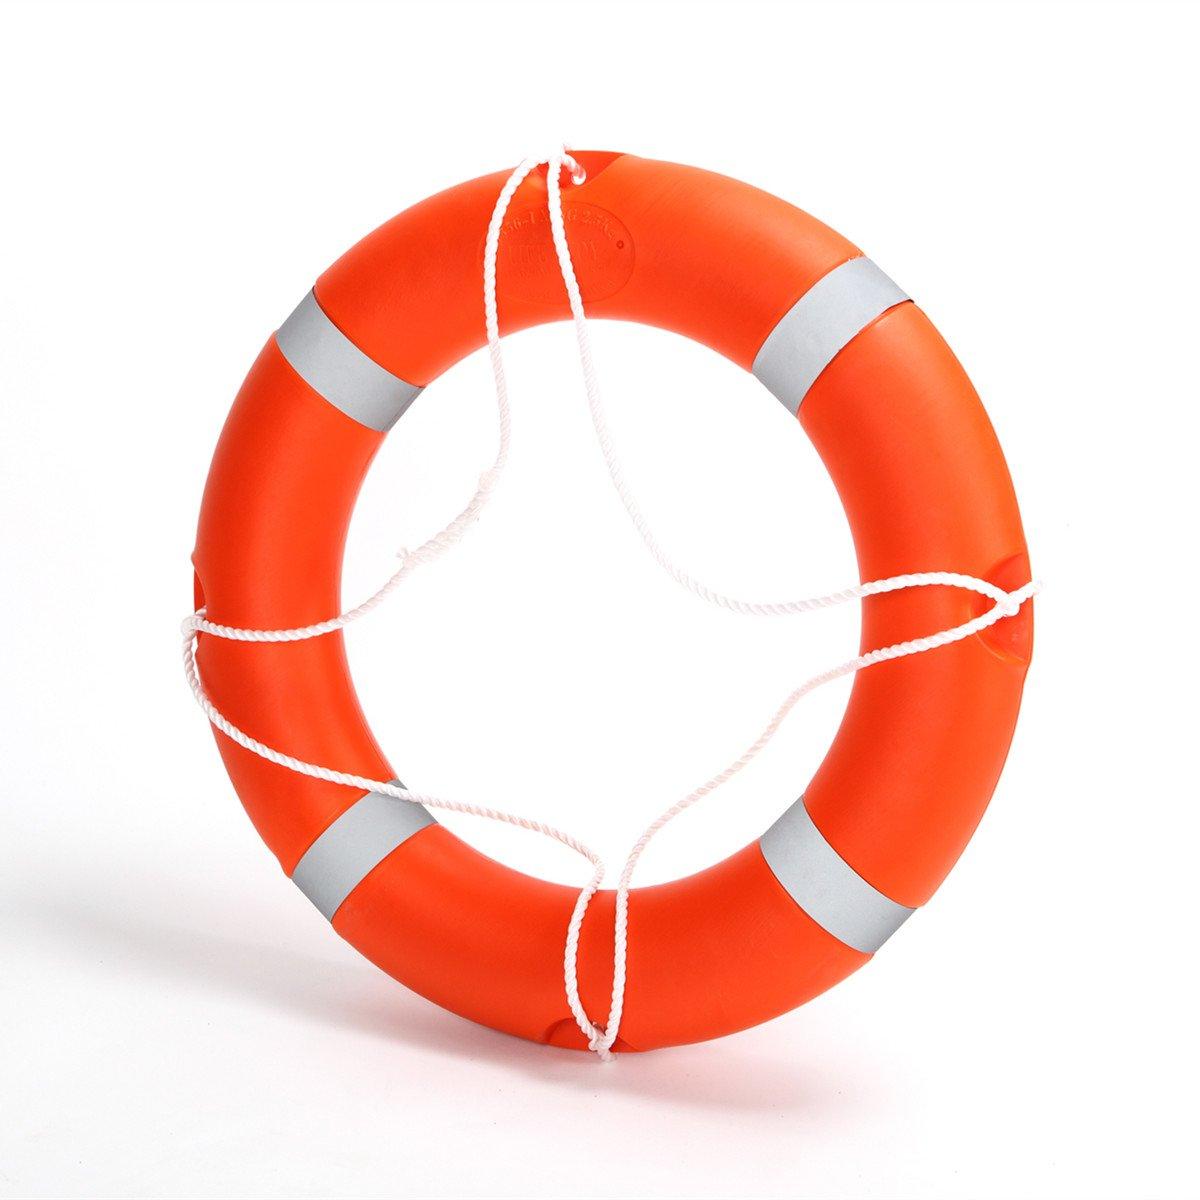 BeautySu. 28'' Diameter Professional Adult Foam Swim Ring Buoy Orange Lifering with White Bands by BeautySu. (Image #1)